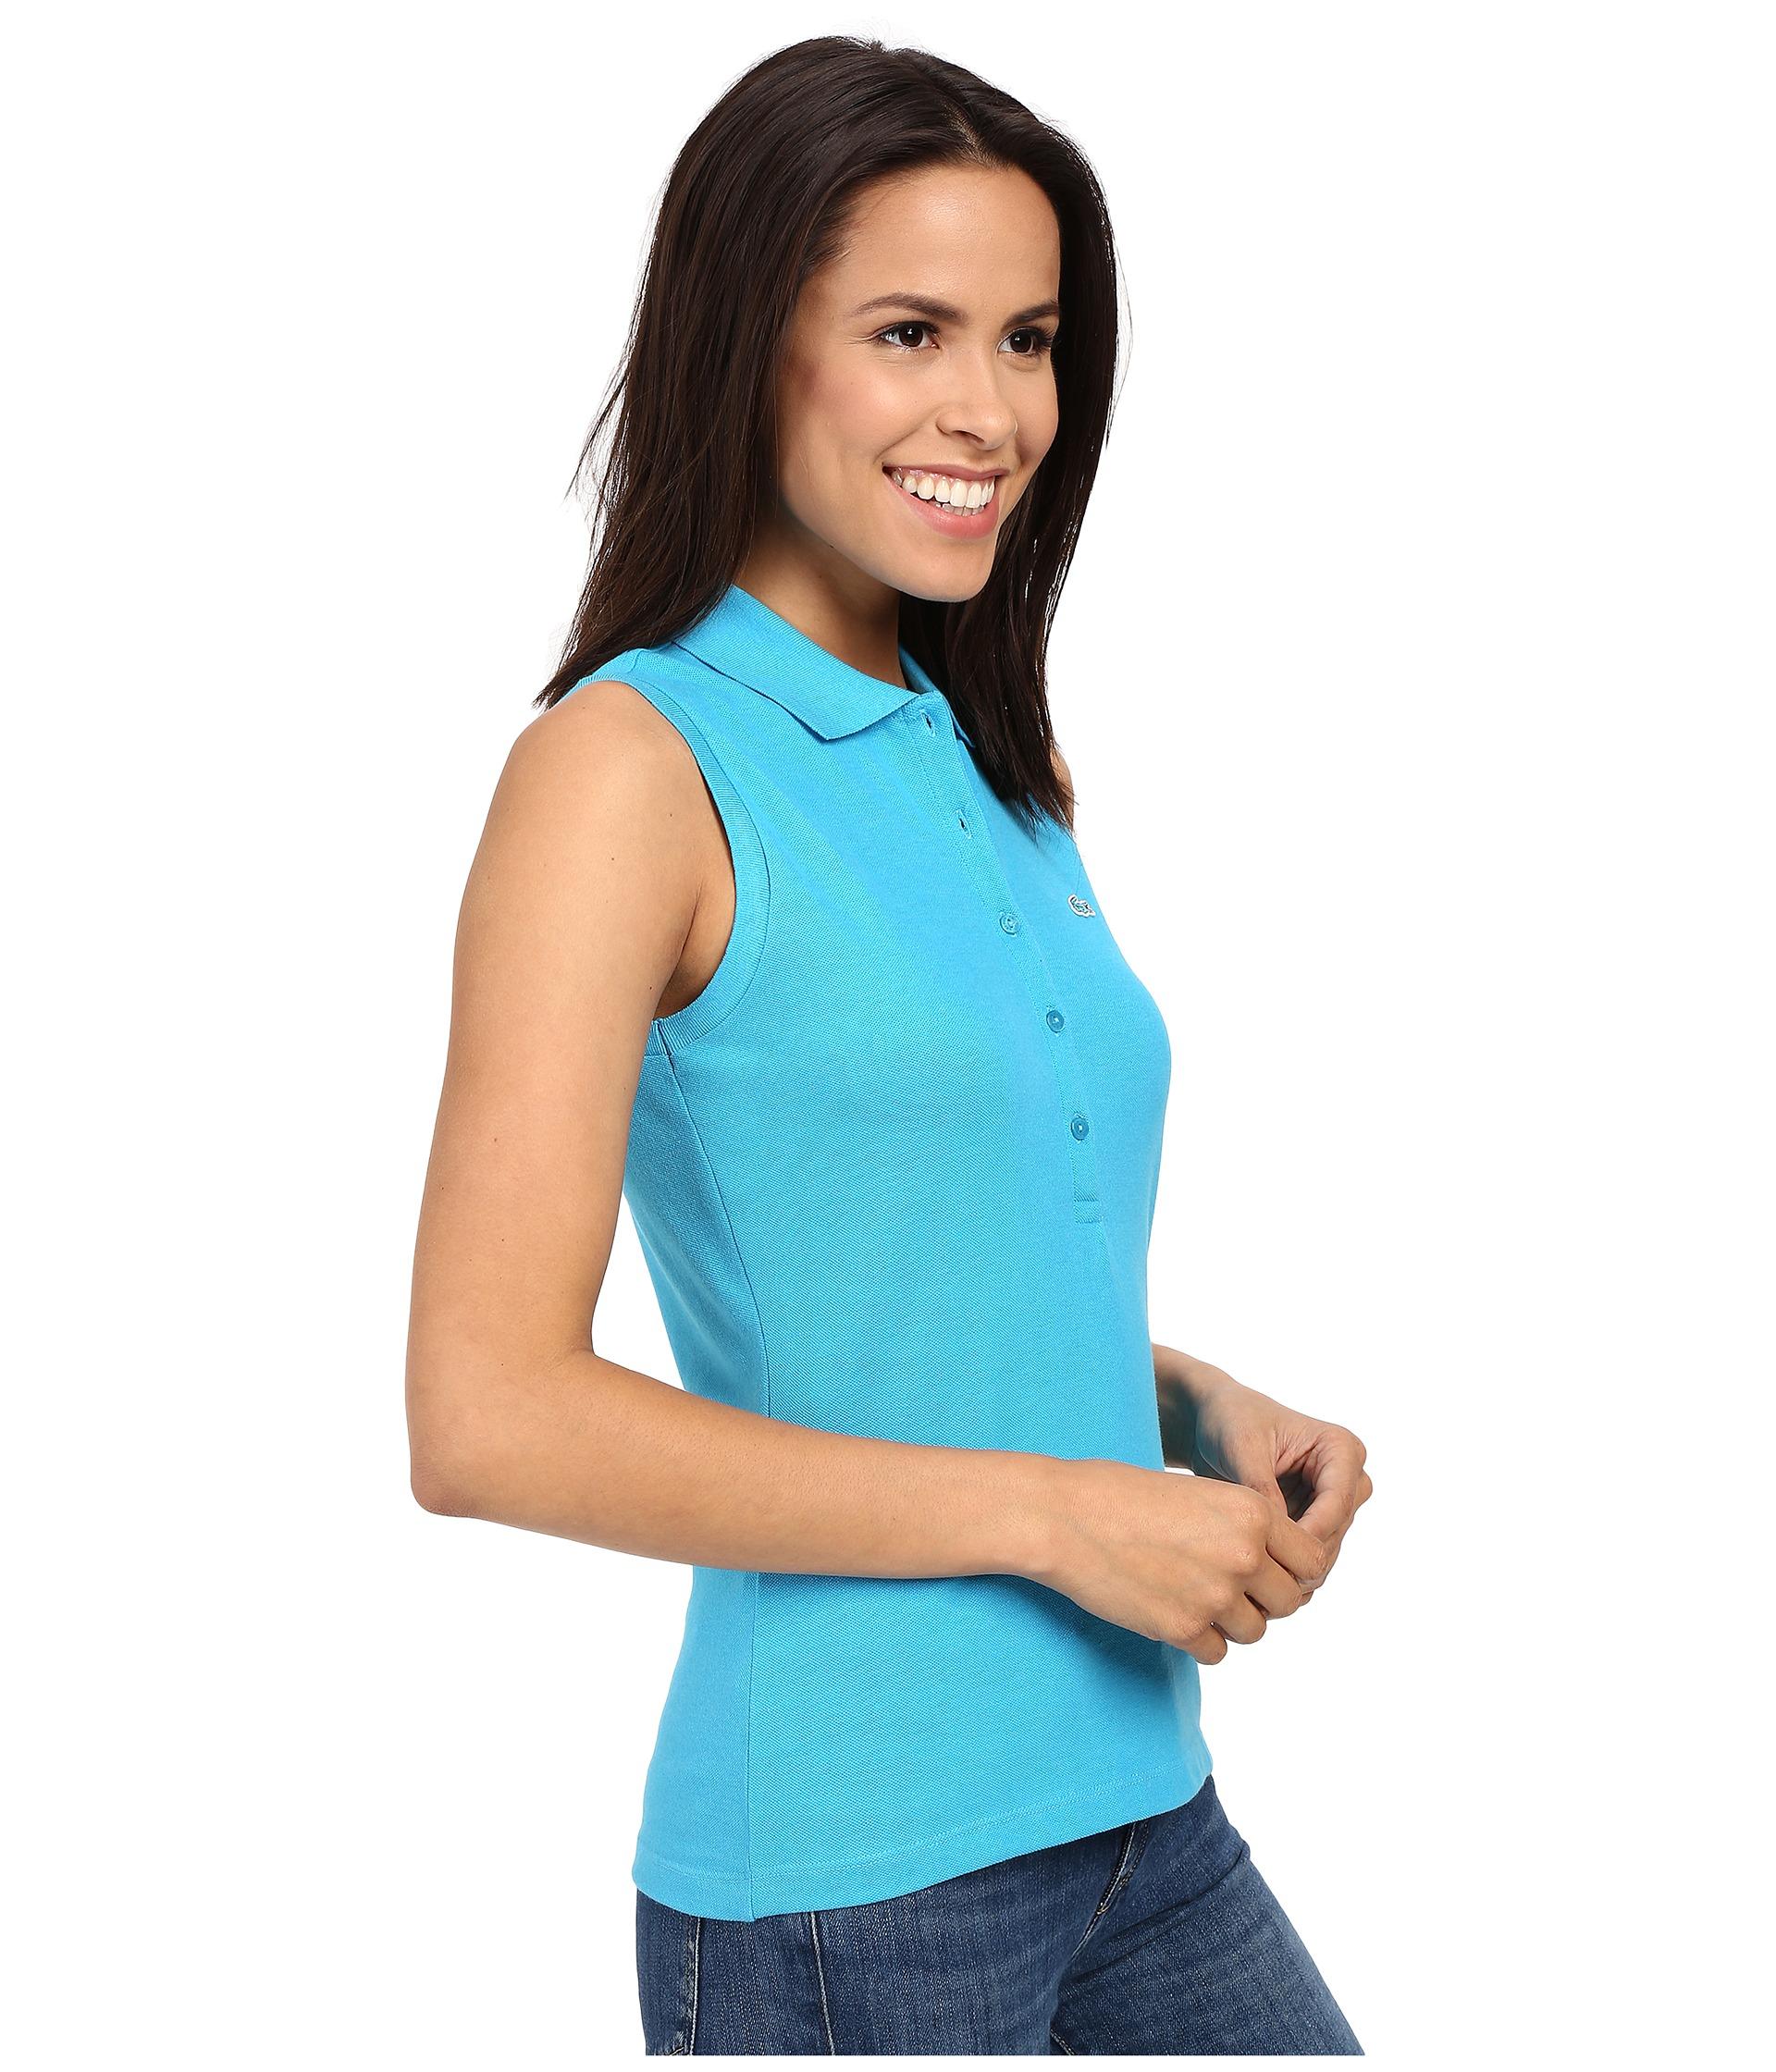 Lacoste Stretch Fit Pique Shirt Blue Slim Sleeveless Polo cF1KJl